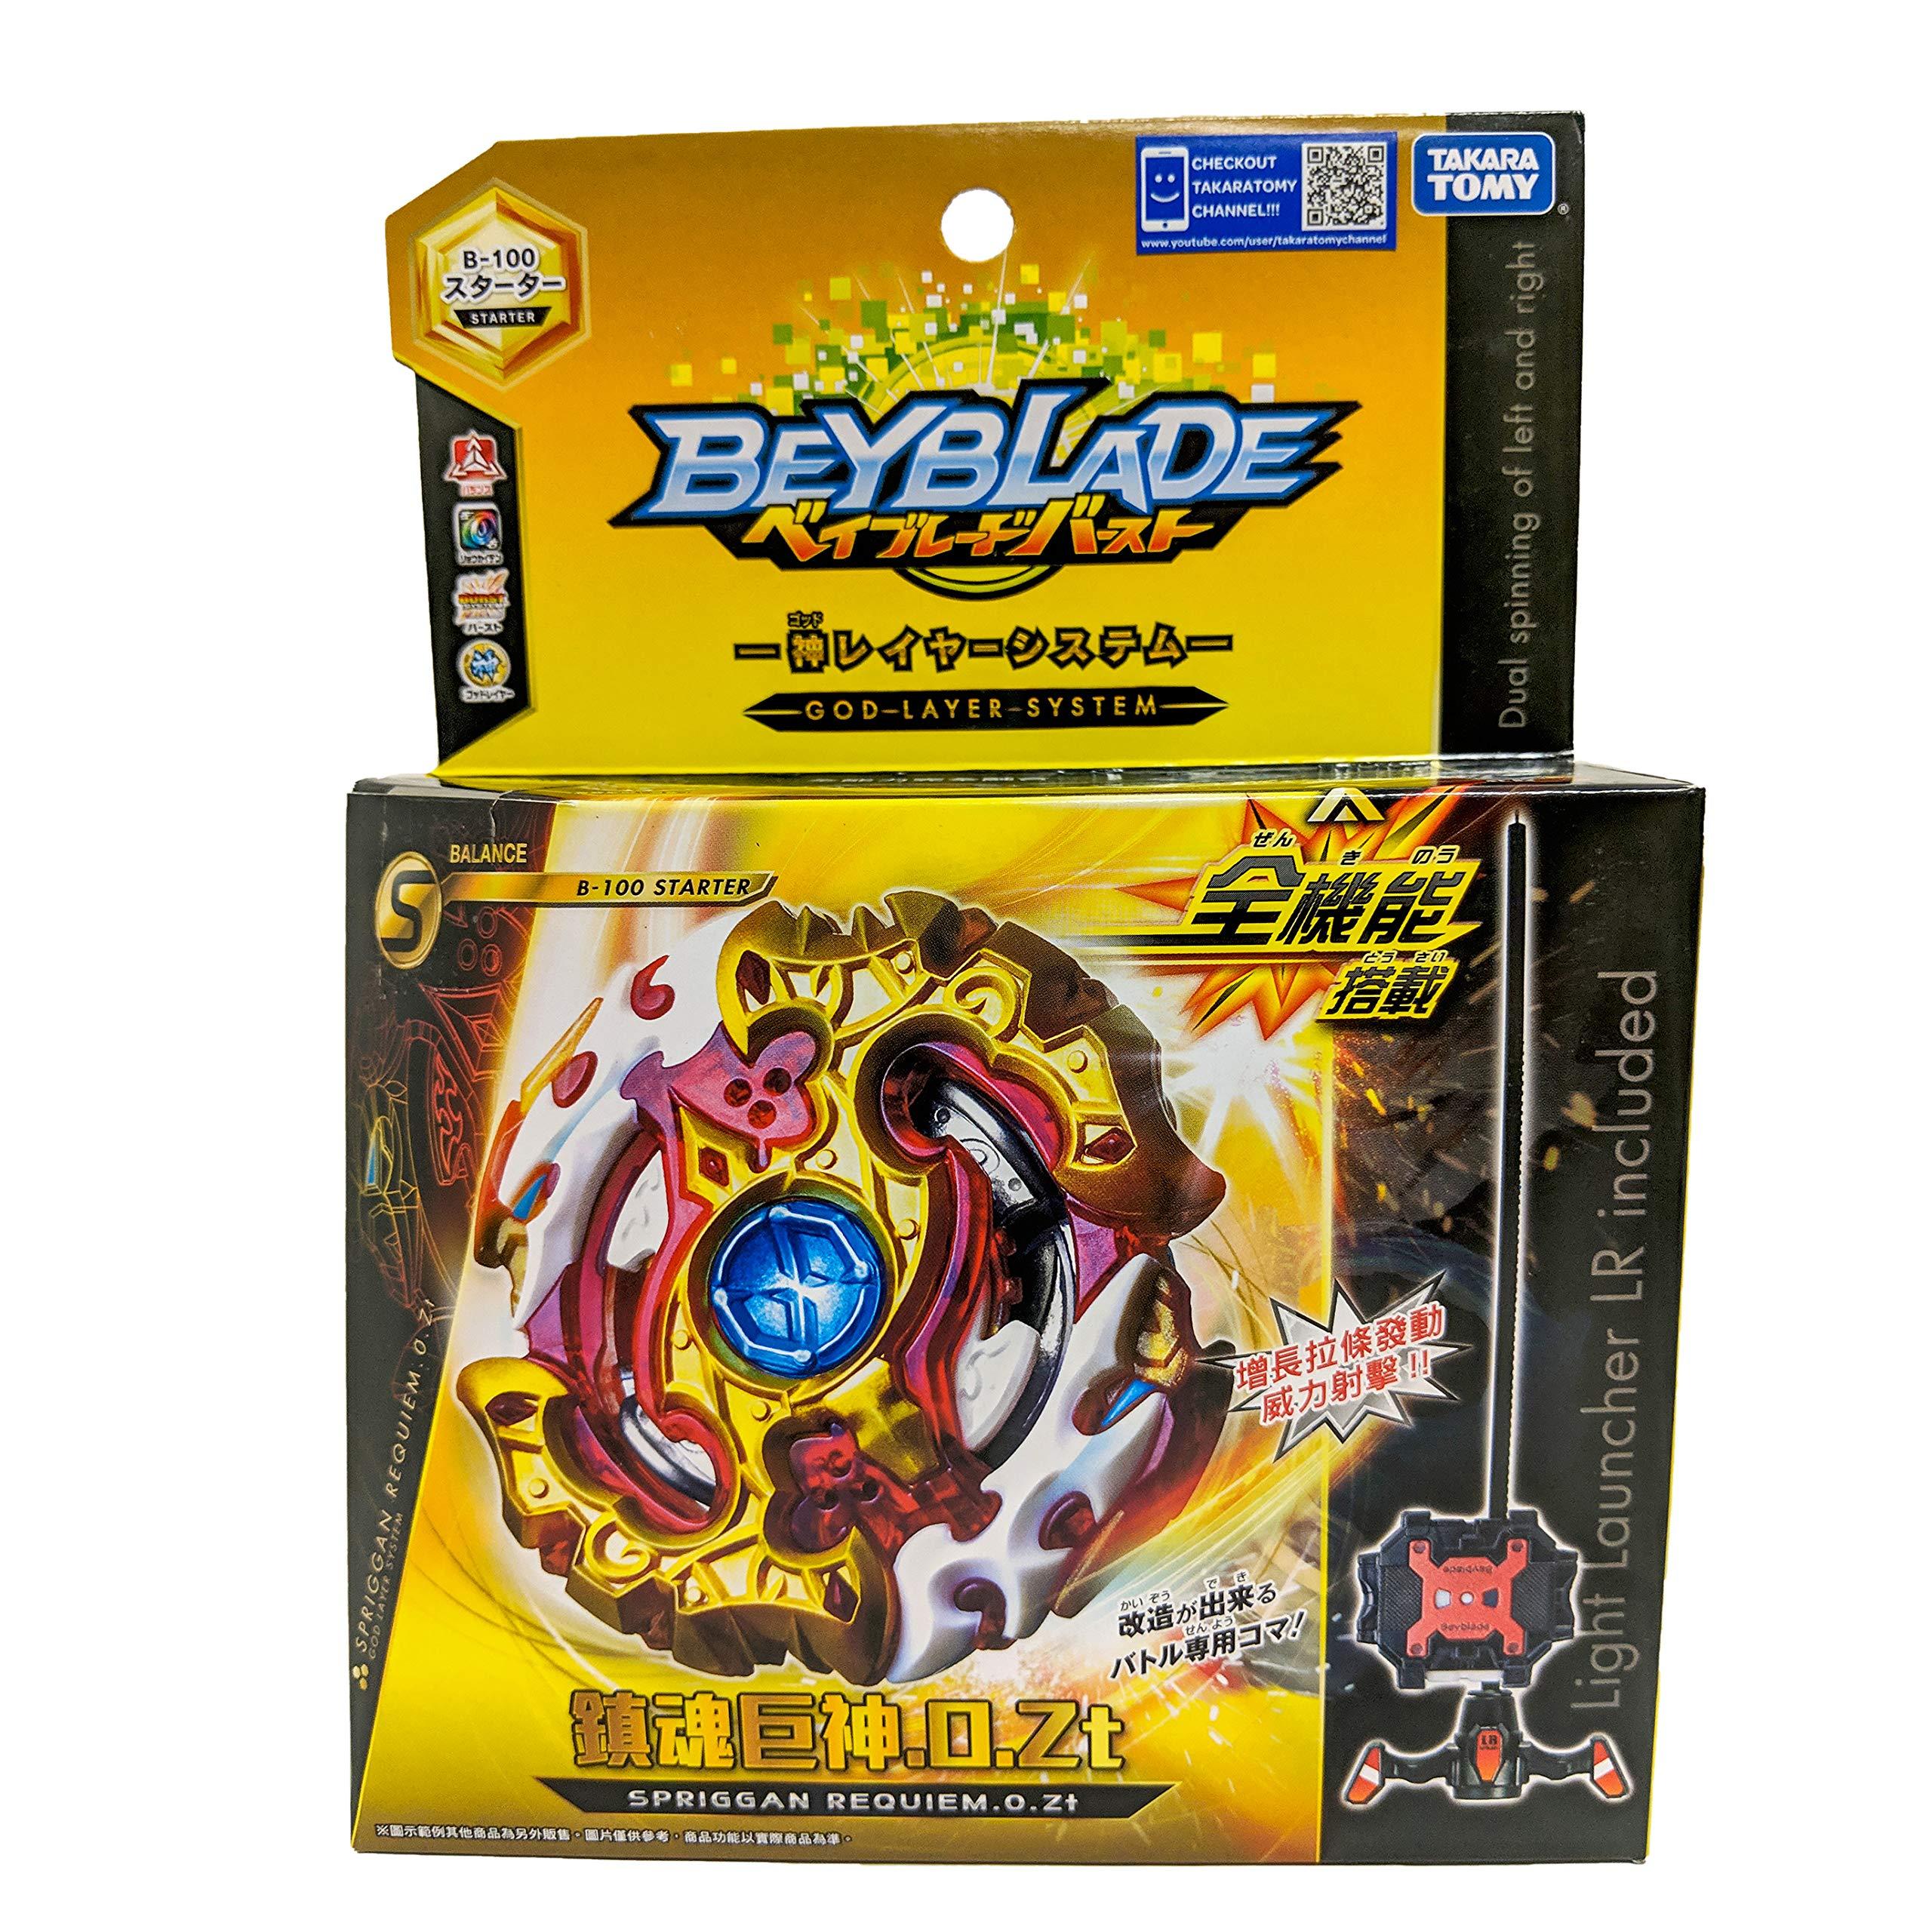 Takara Tomy 4904810106791 Beyblade Burst B-100 Spriggan Requiem Spin Top (Taiwan Version) by Takaratomy